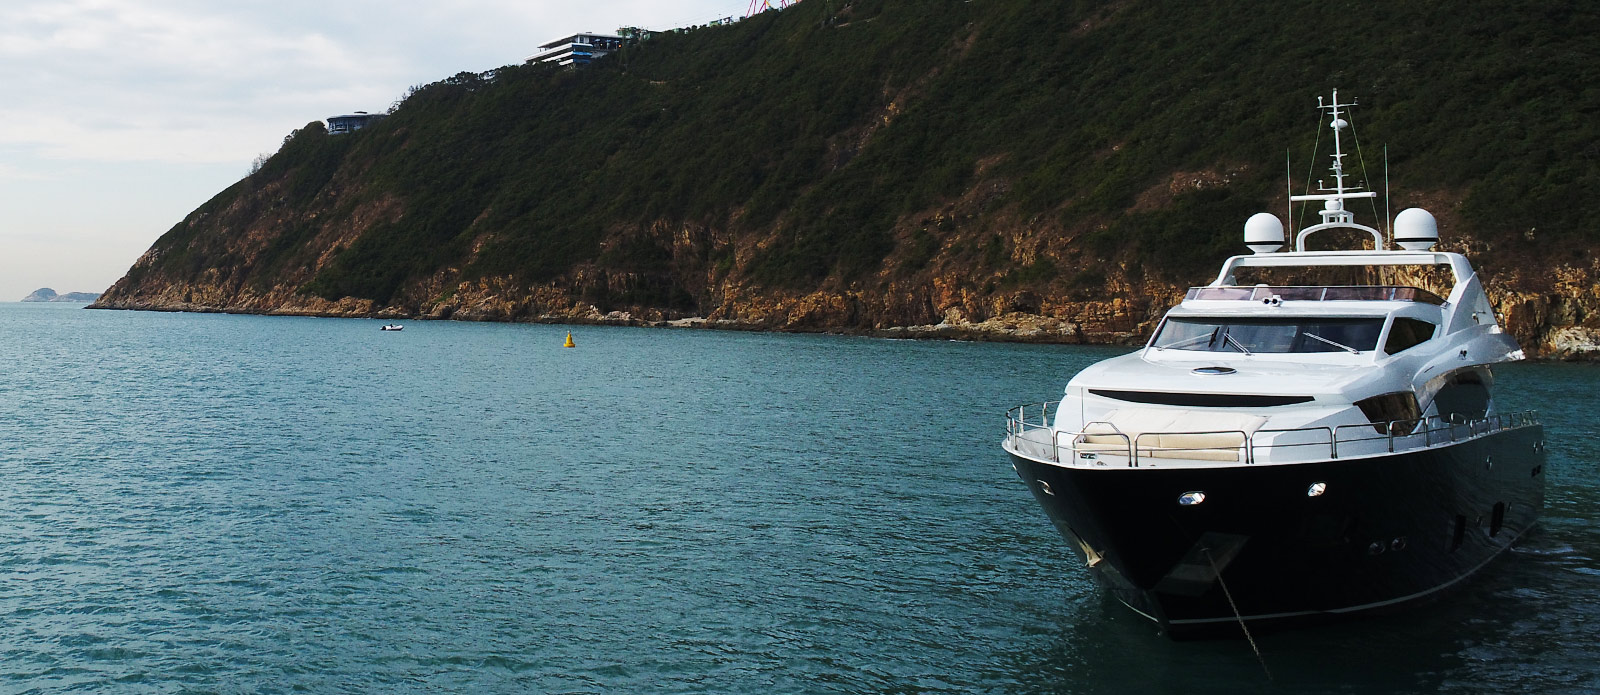 Sunseeker-30-Metre-Yacht-Coraysa-at-Anchor